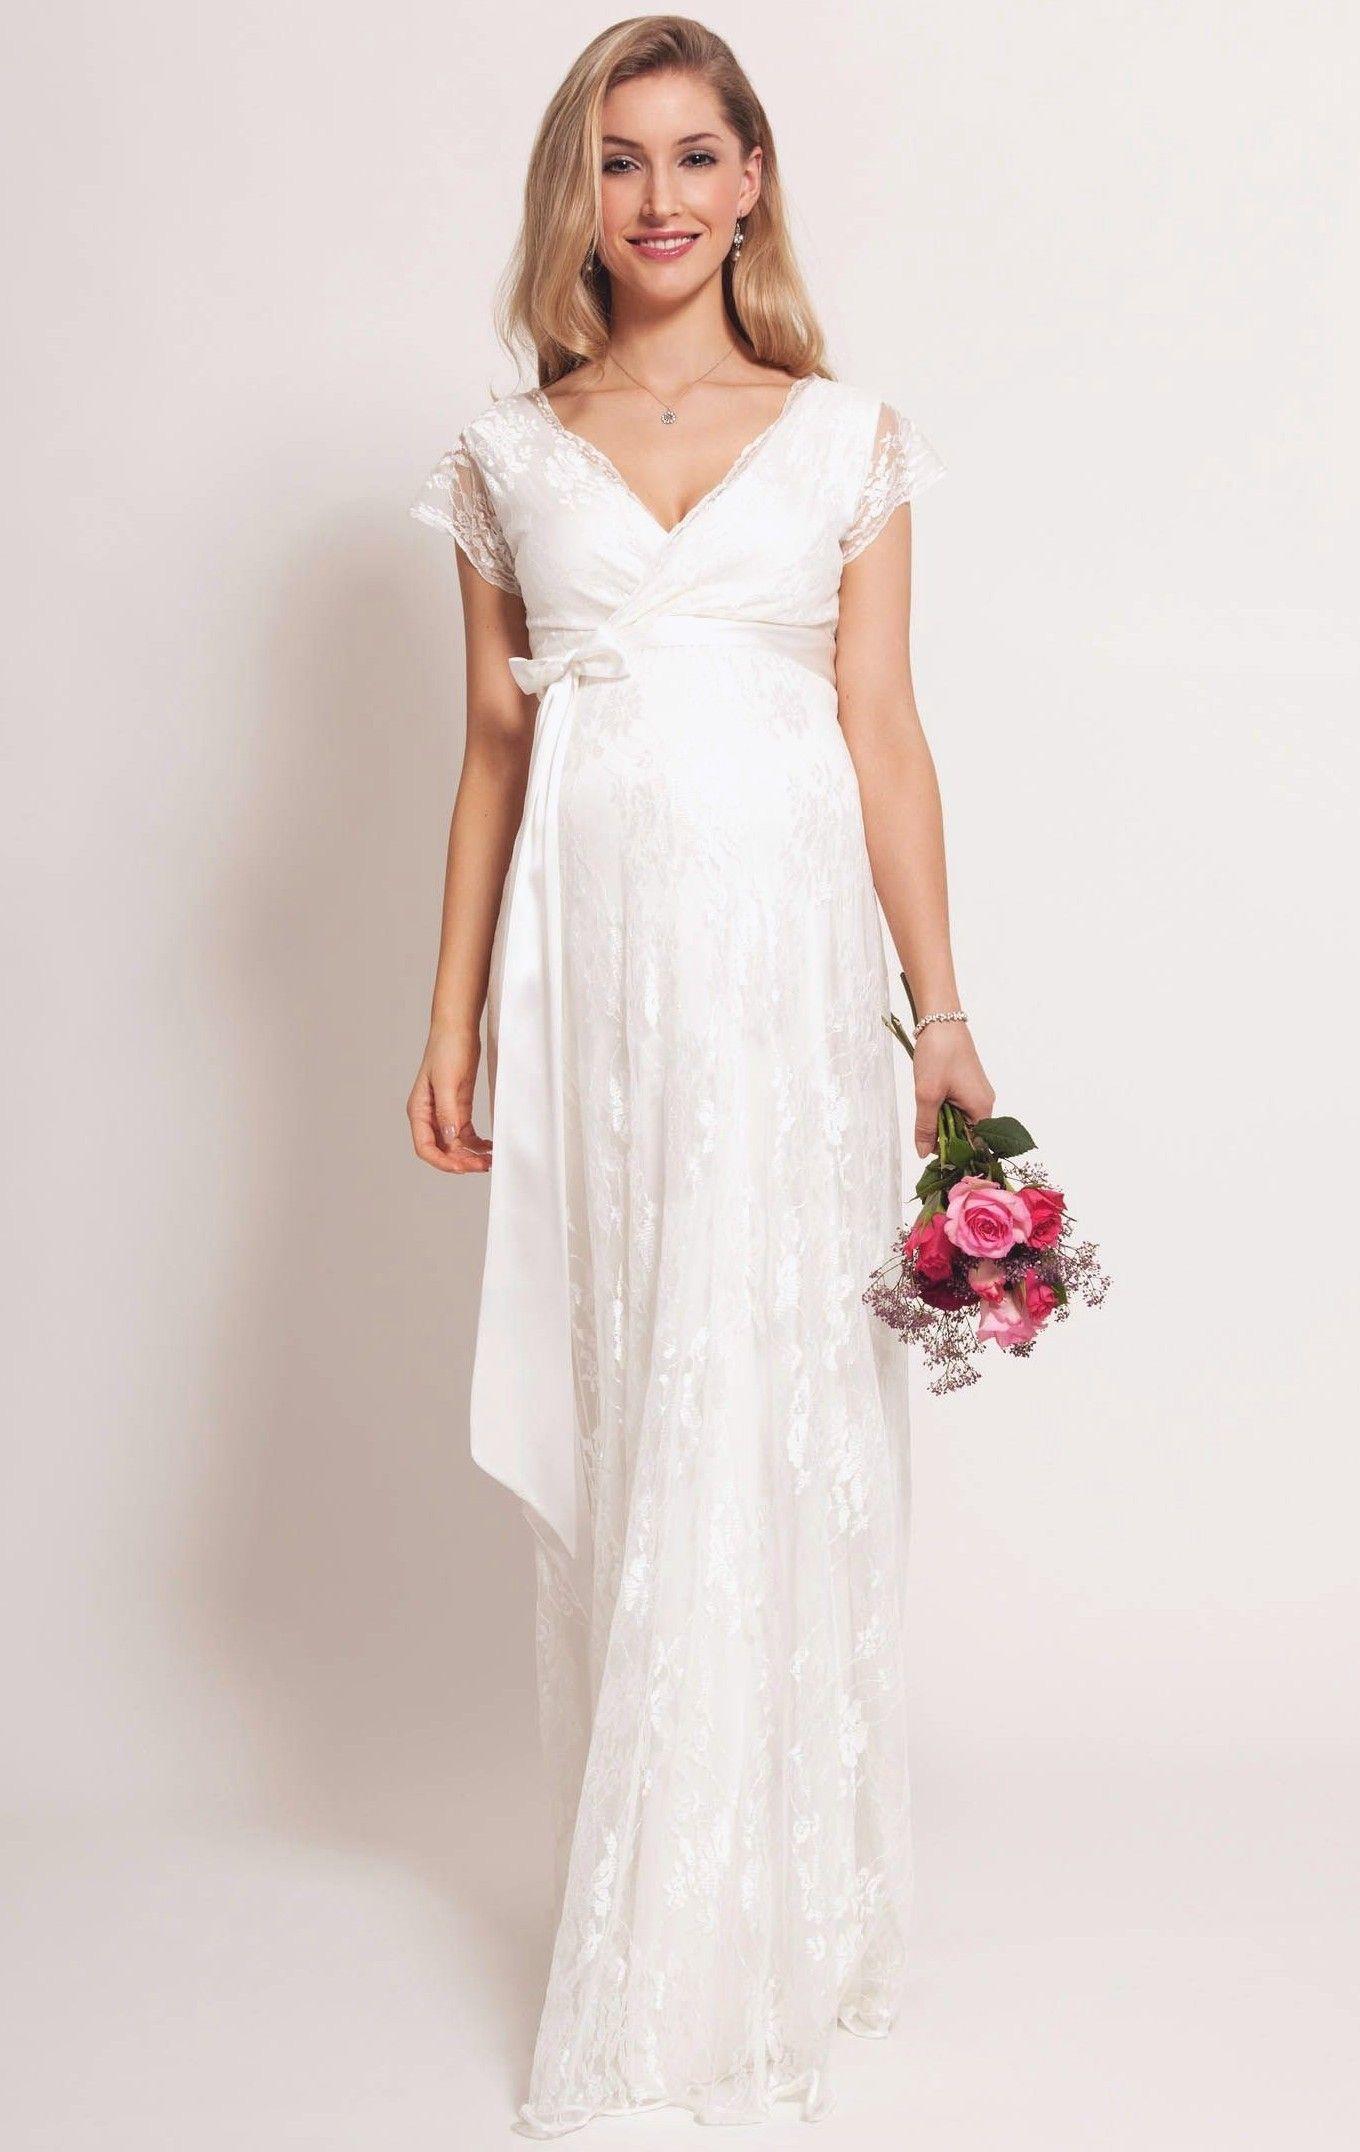 6d123a248a576 70+ Wedding Dress for Pregnant Brides Ideas | Wedding dresses ...